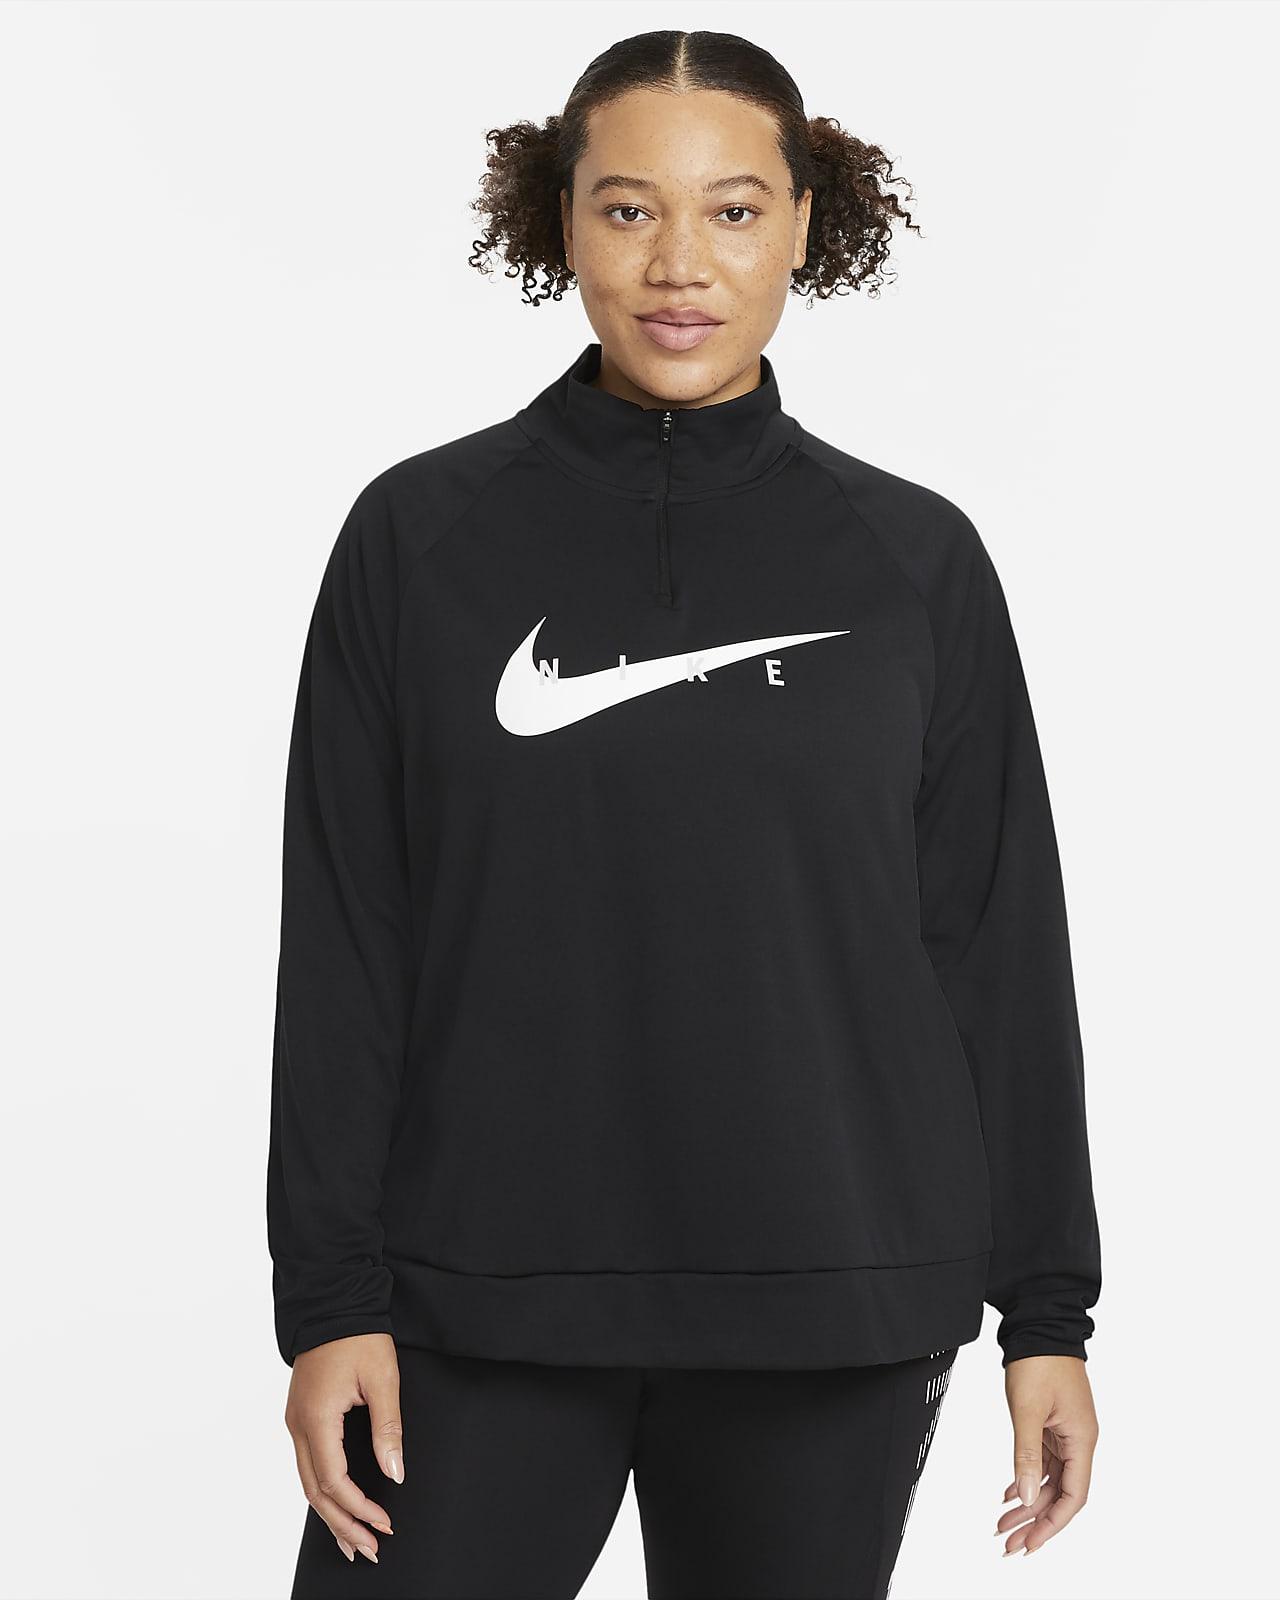 Haut de running Nike Swoosh Run pour Femme (grande taille)